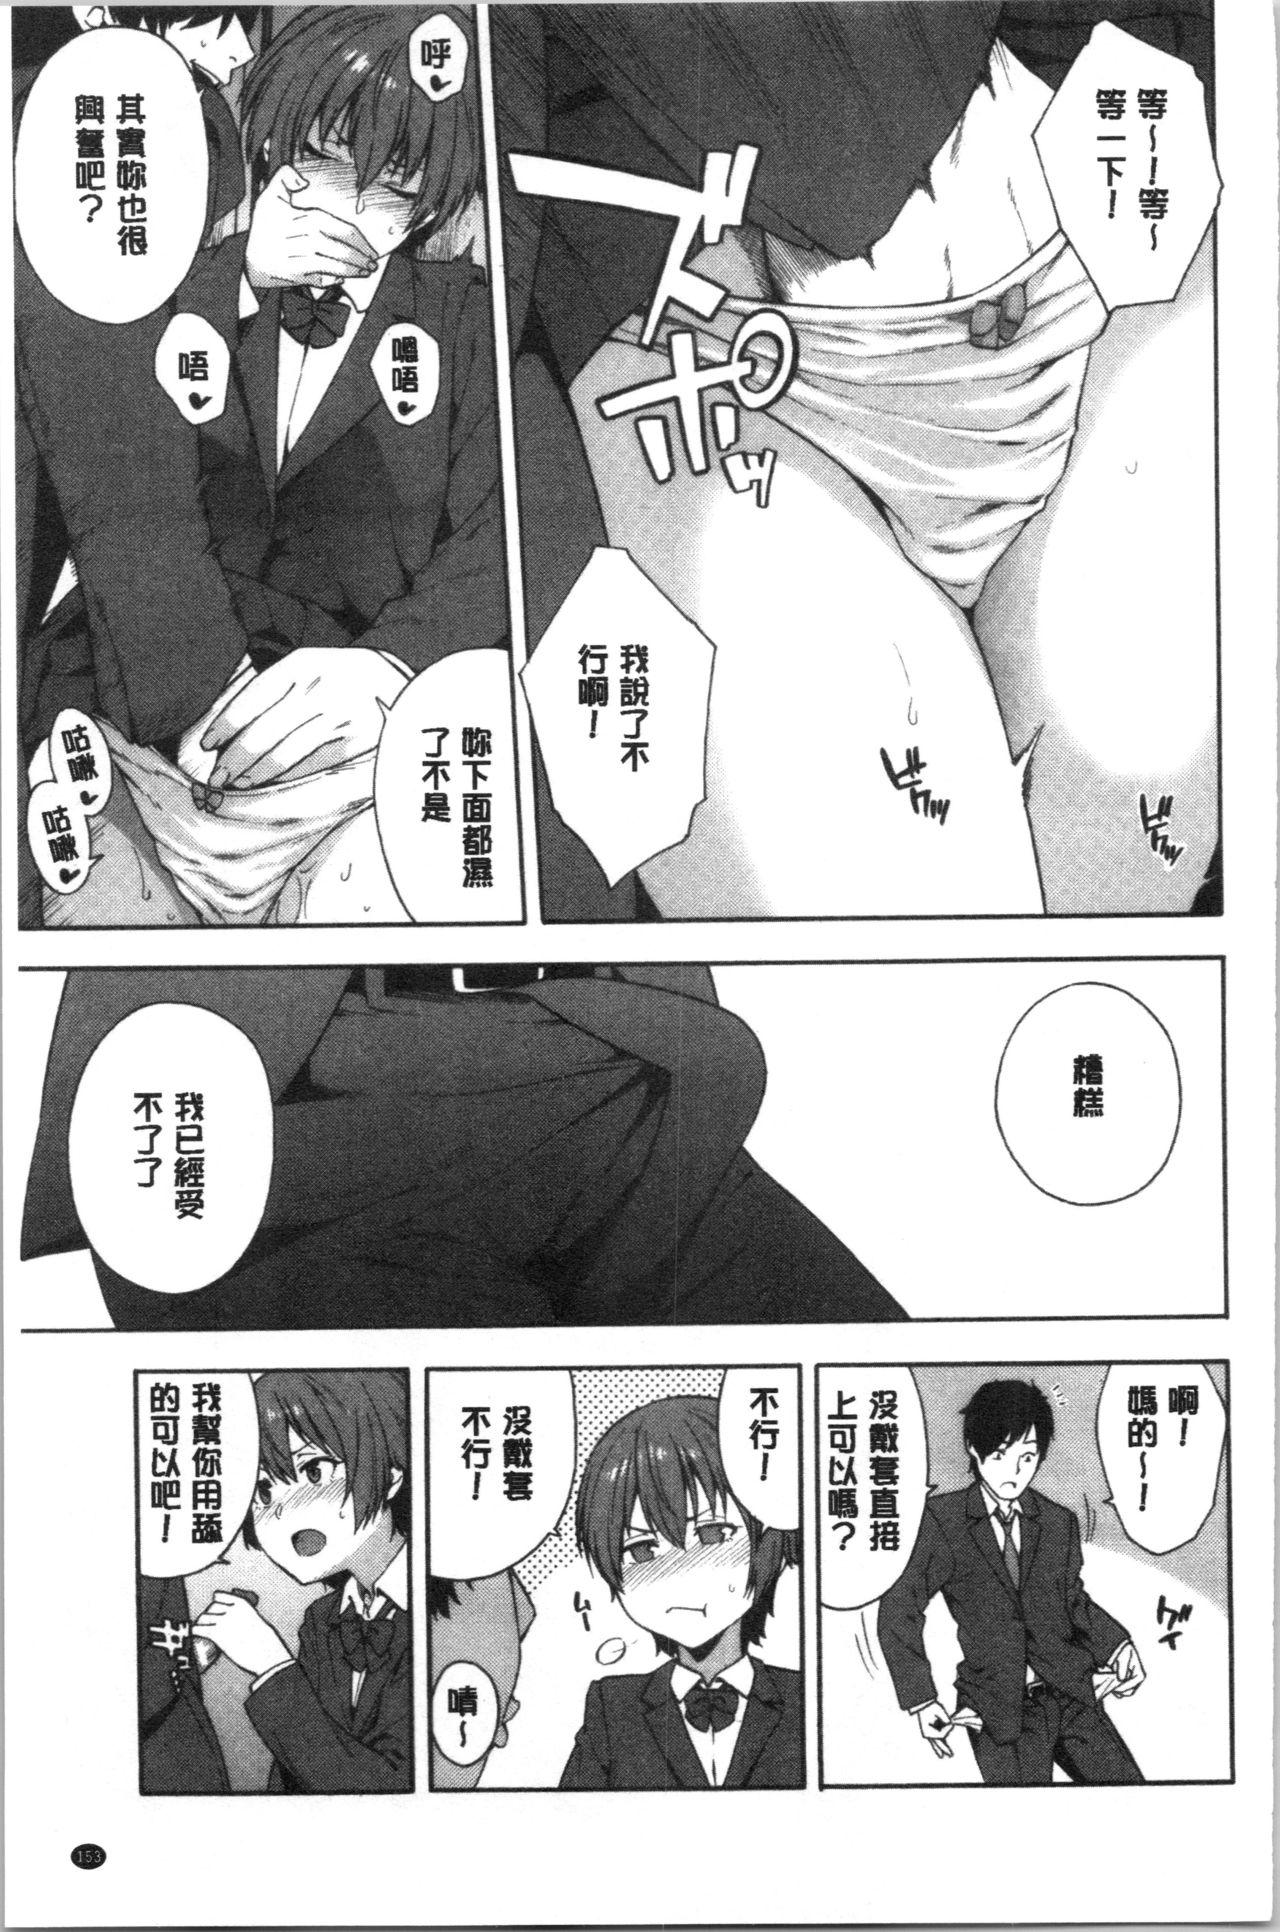 Okashite Ageru | 讓你來侵犯我 155